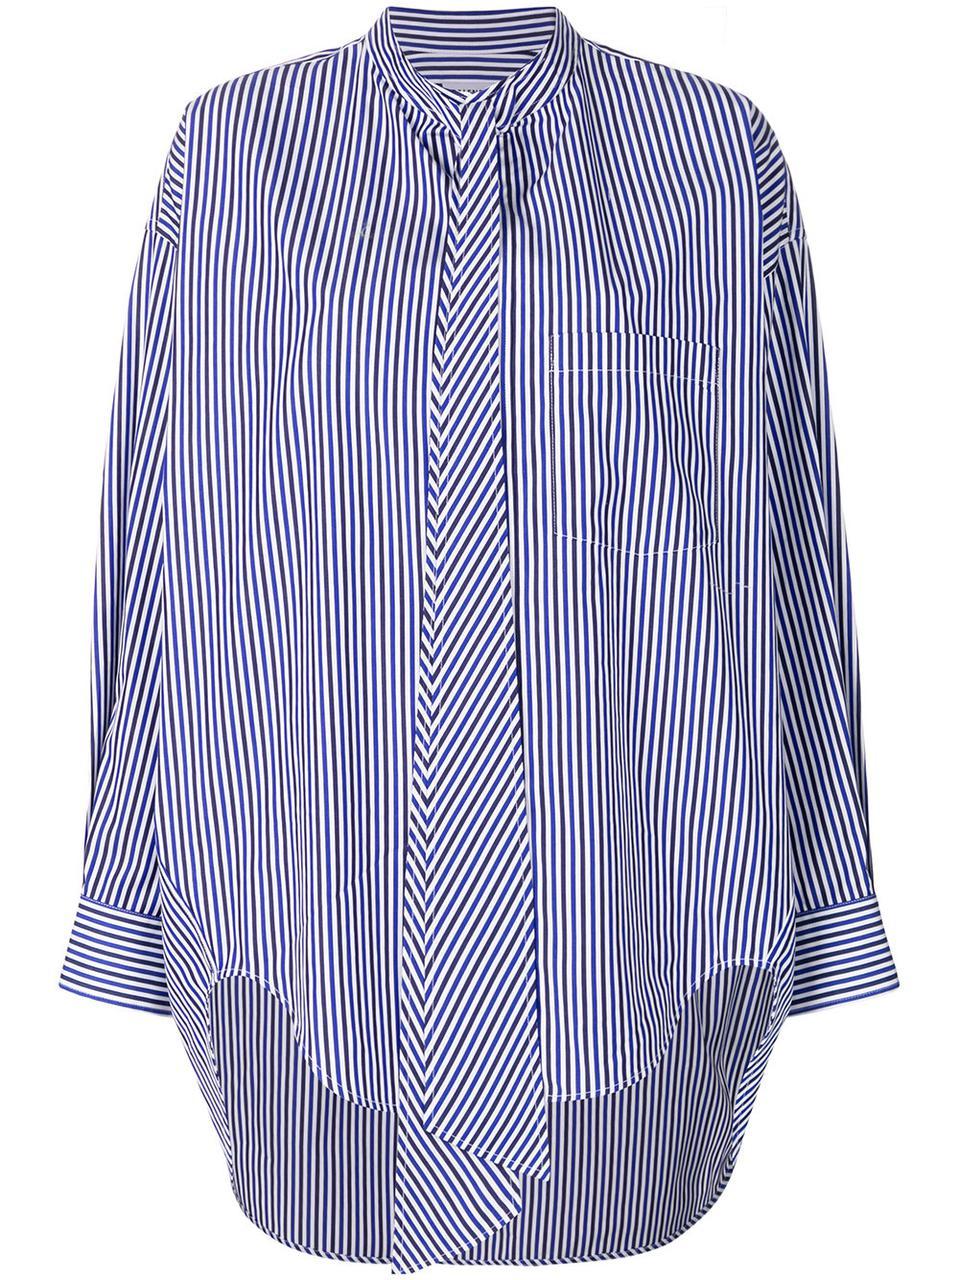 Рубашка Balensiaga туника женская РАЗМЕР+